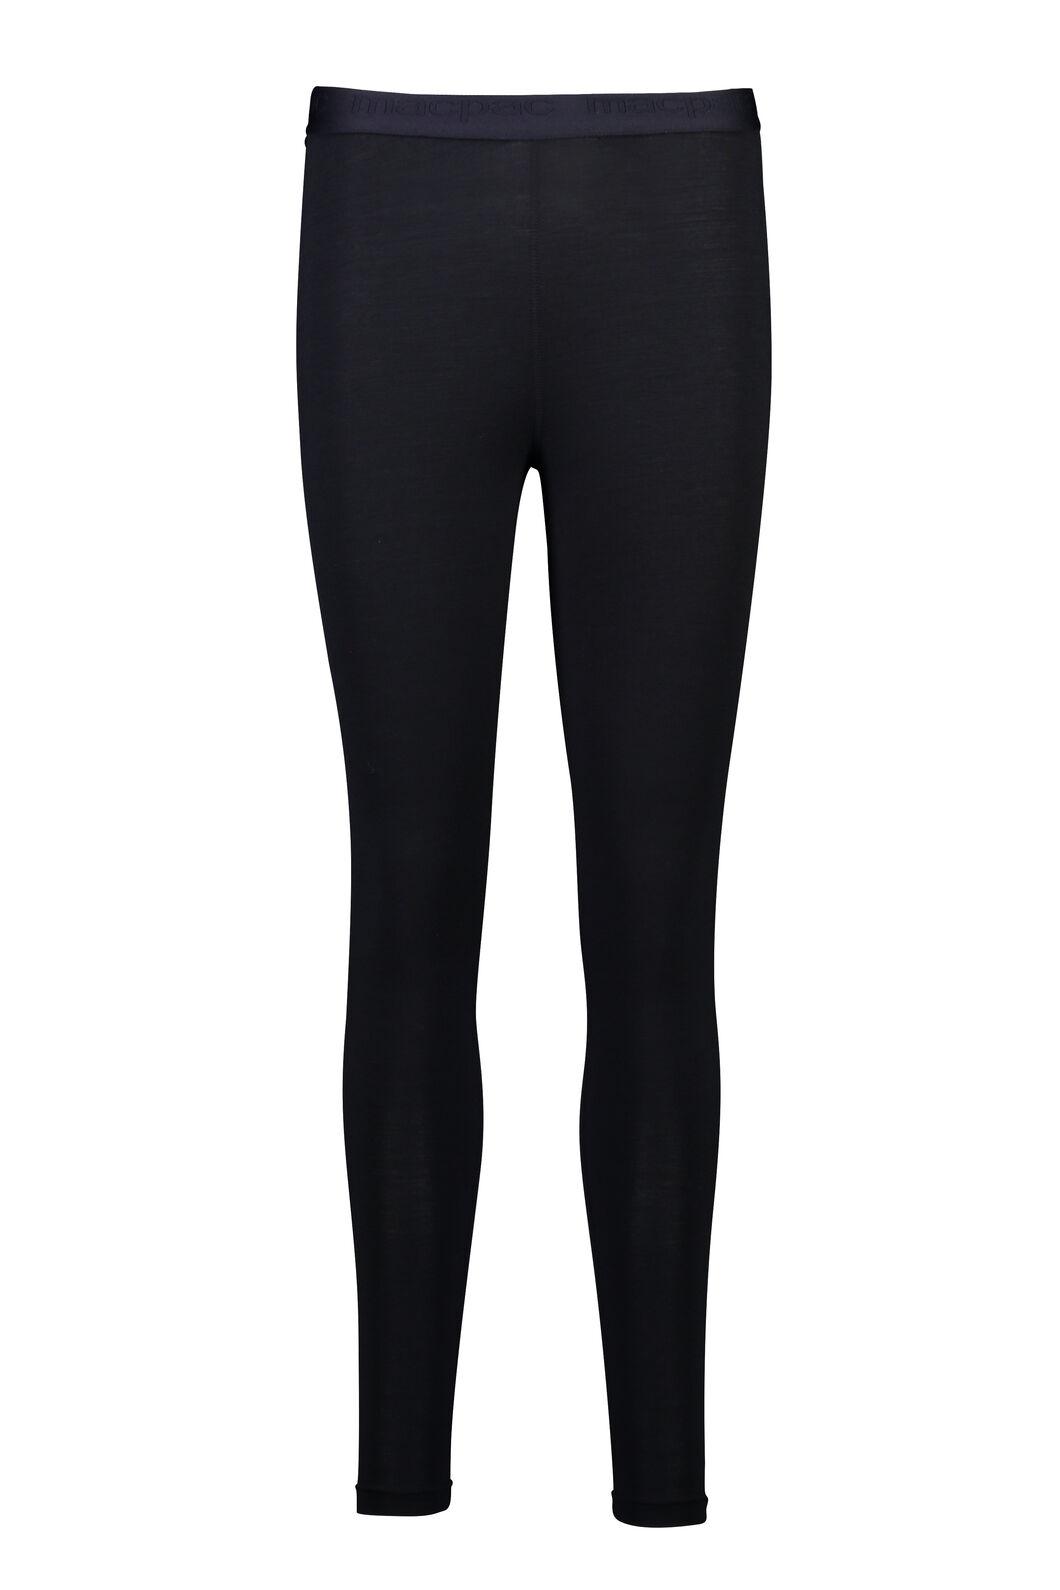 Macpac 180 Merino Long Johns — Women's, Black, hi-res